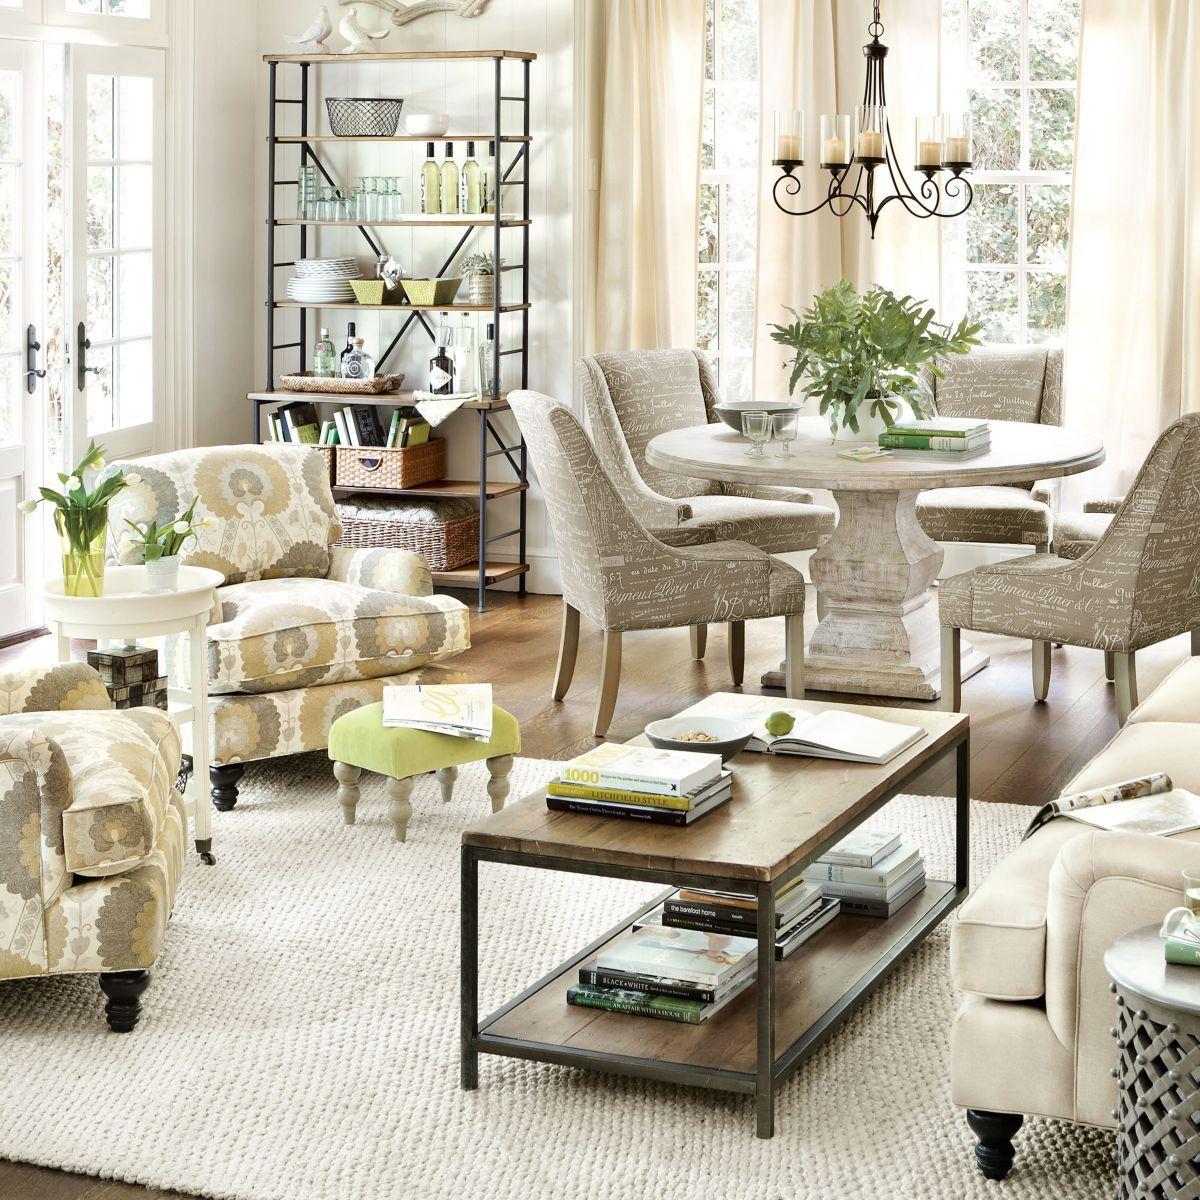 Living room furniture living room decor ballard - Furnish decorador de interiores ...